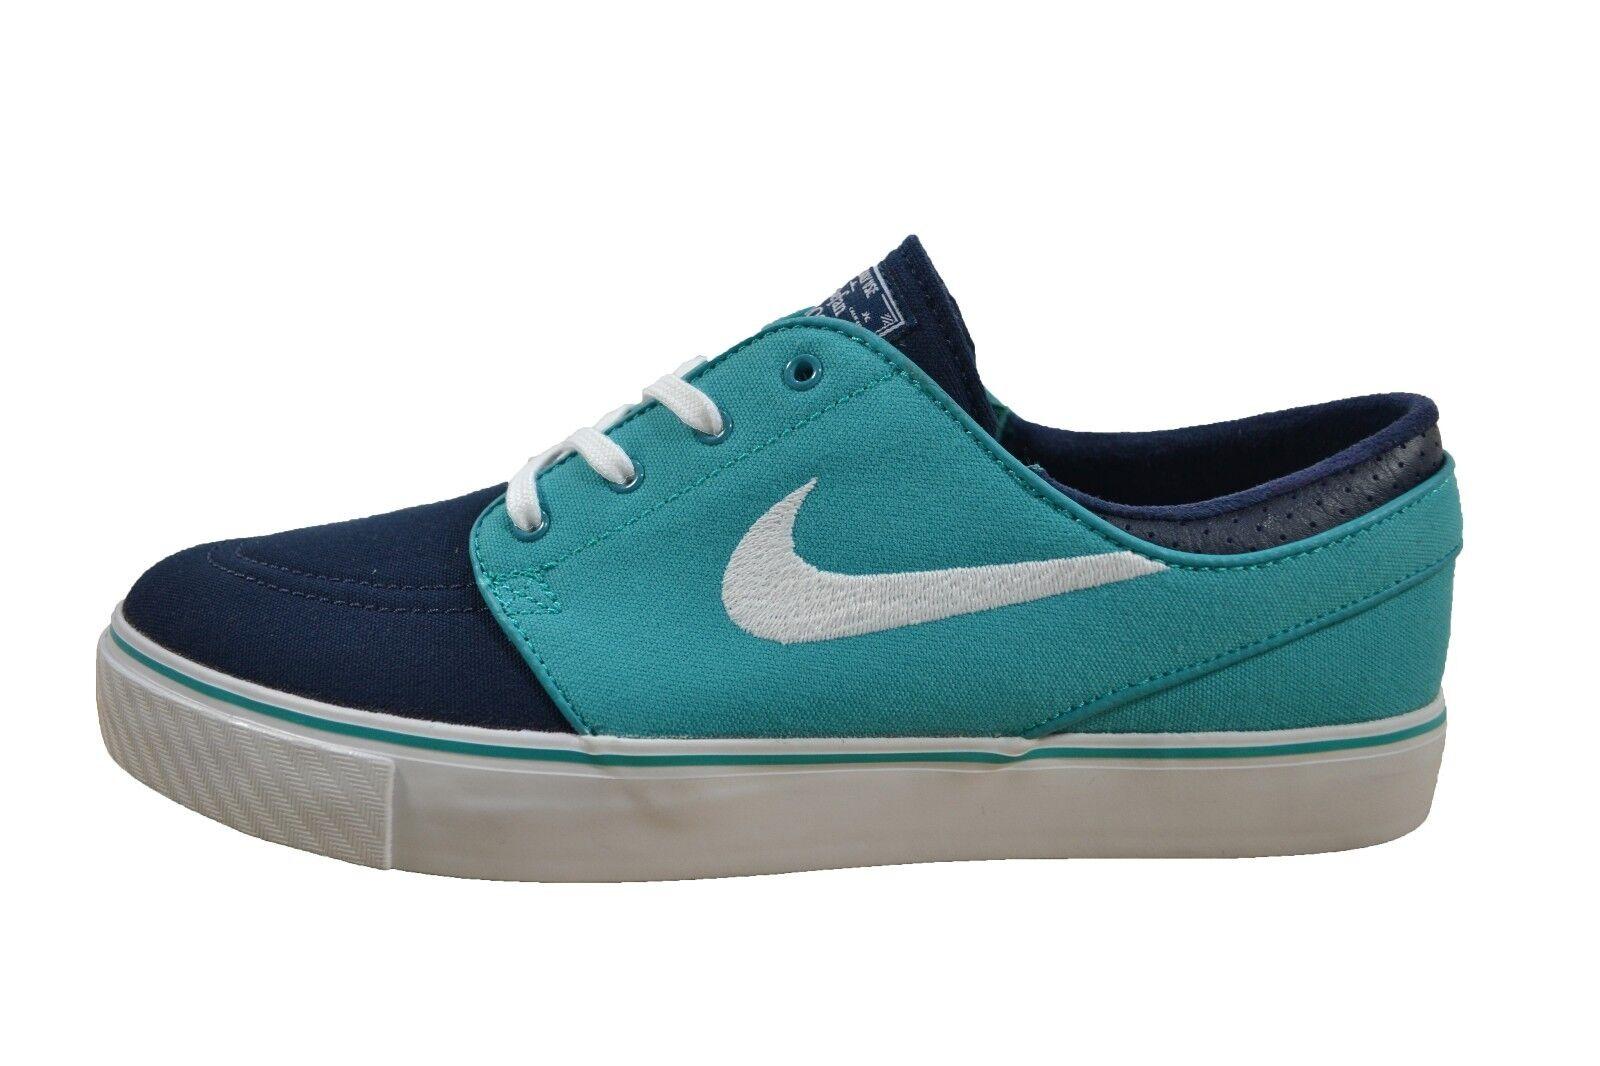 Nike Nike Nike ZOOM STEFAN JANOSKI CNVS Turbo Green White Obsidian (393) Men's Shoes 733ca8